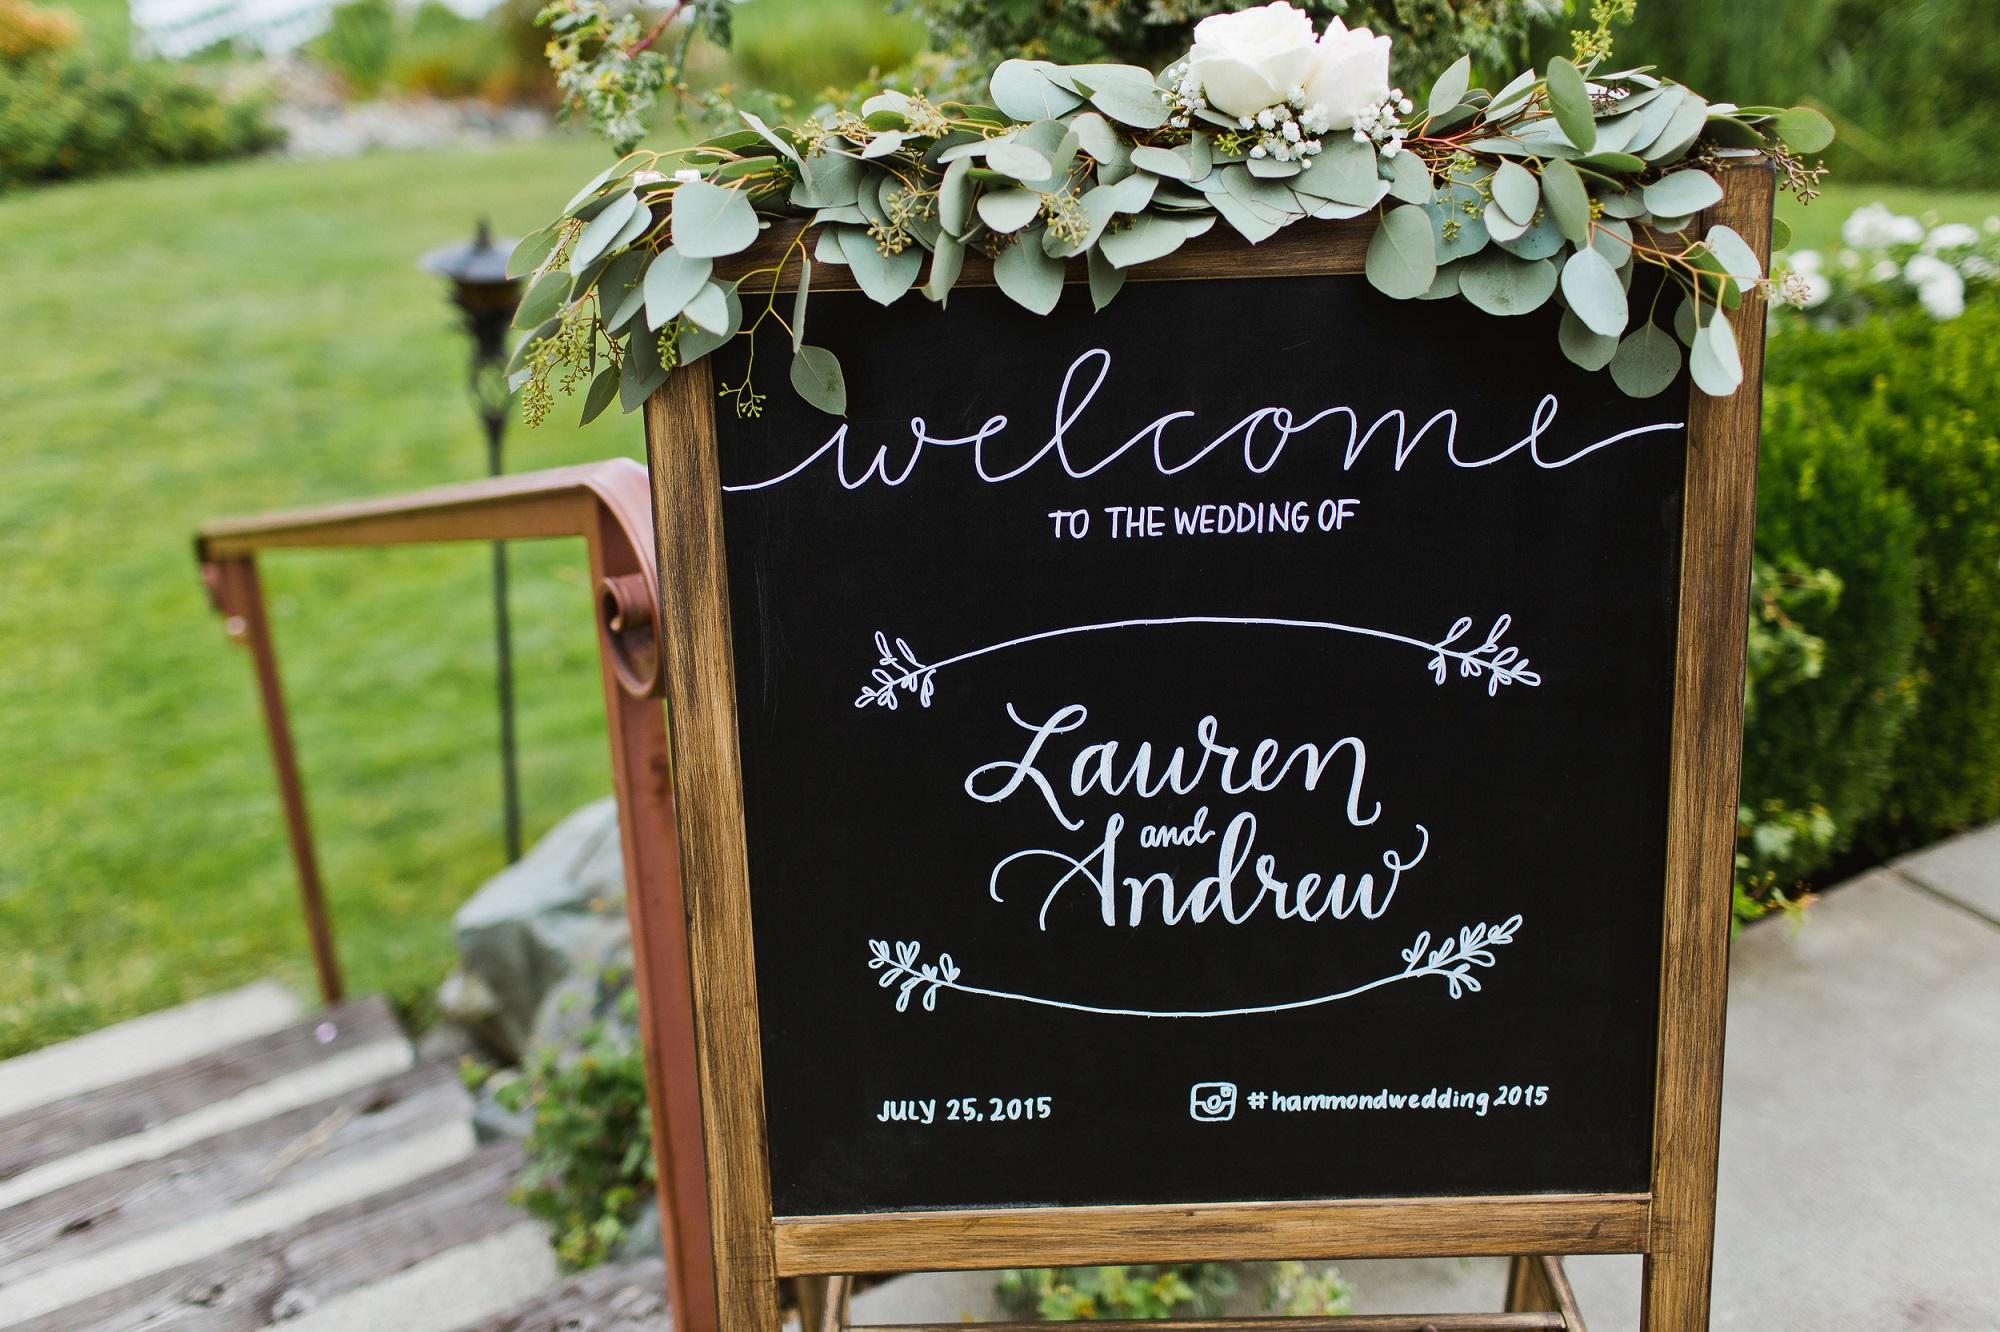 Welkomstbord met sierlijke krijtbord letters